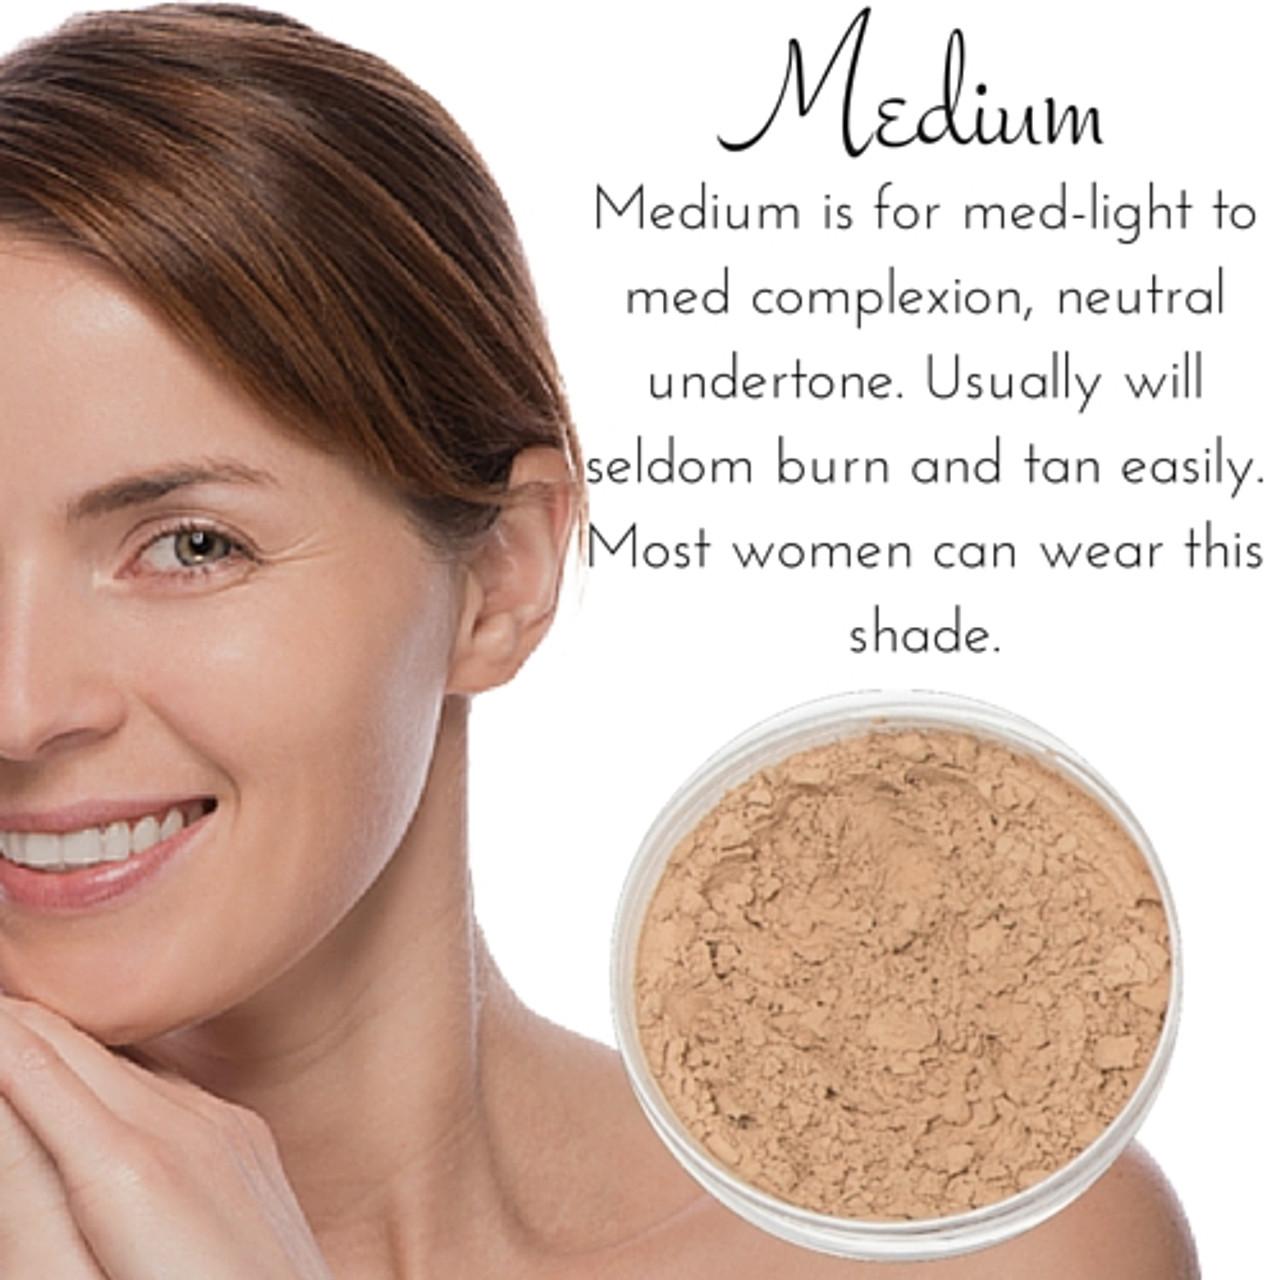 Full Coverage Matte Mineral Foundation Medium Smm Cosmetics